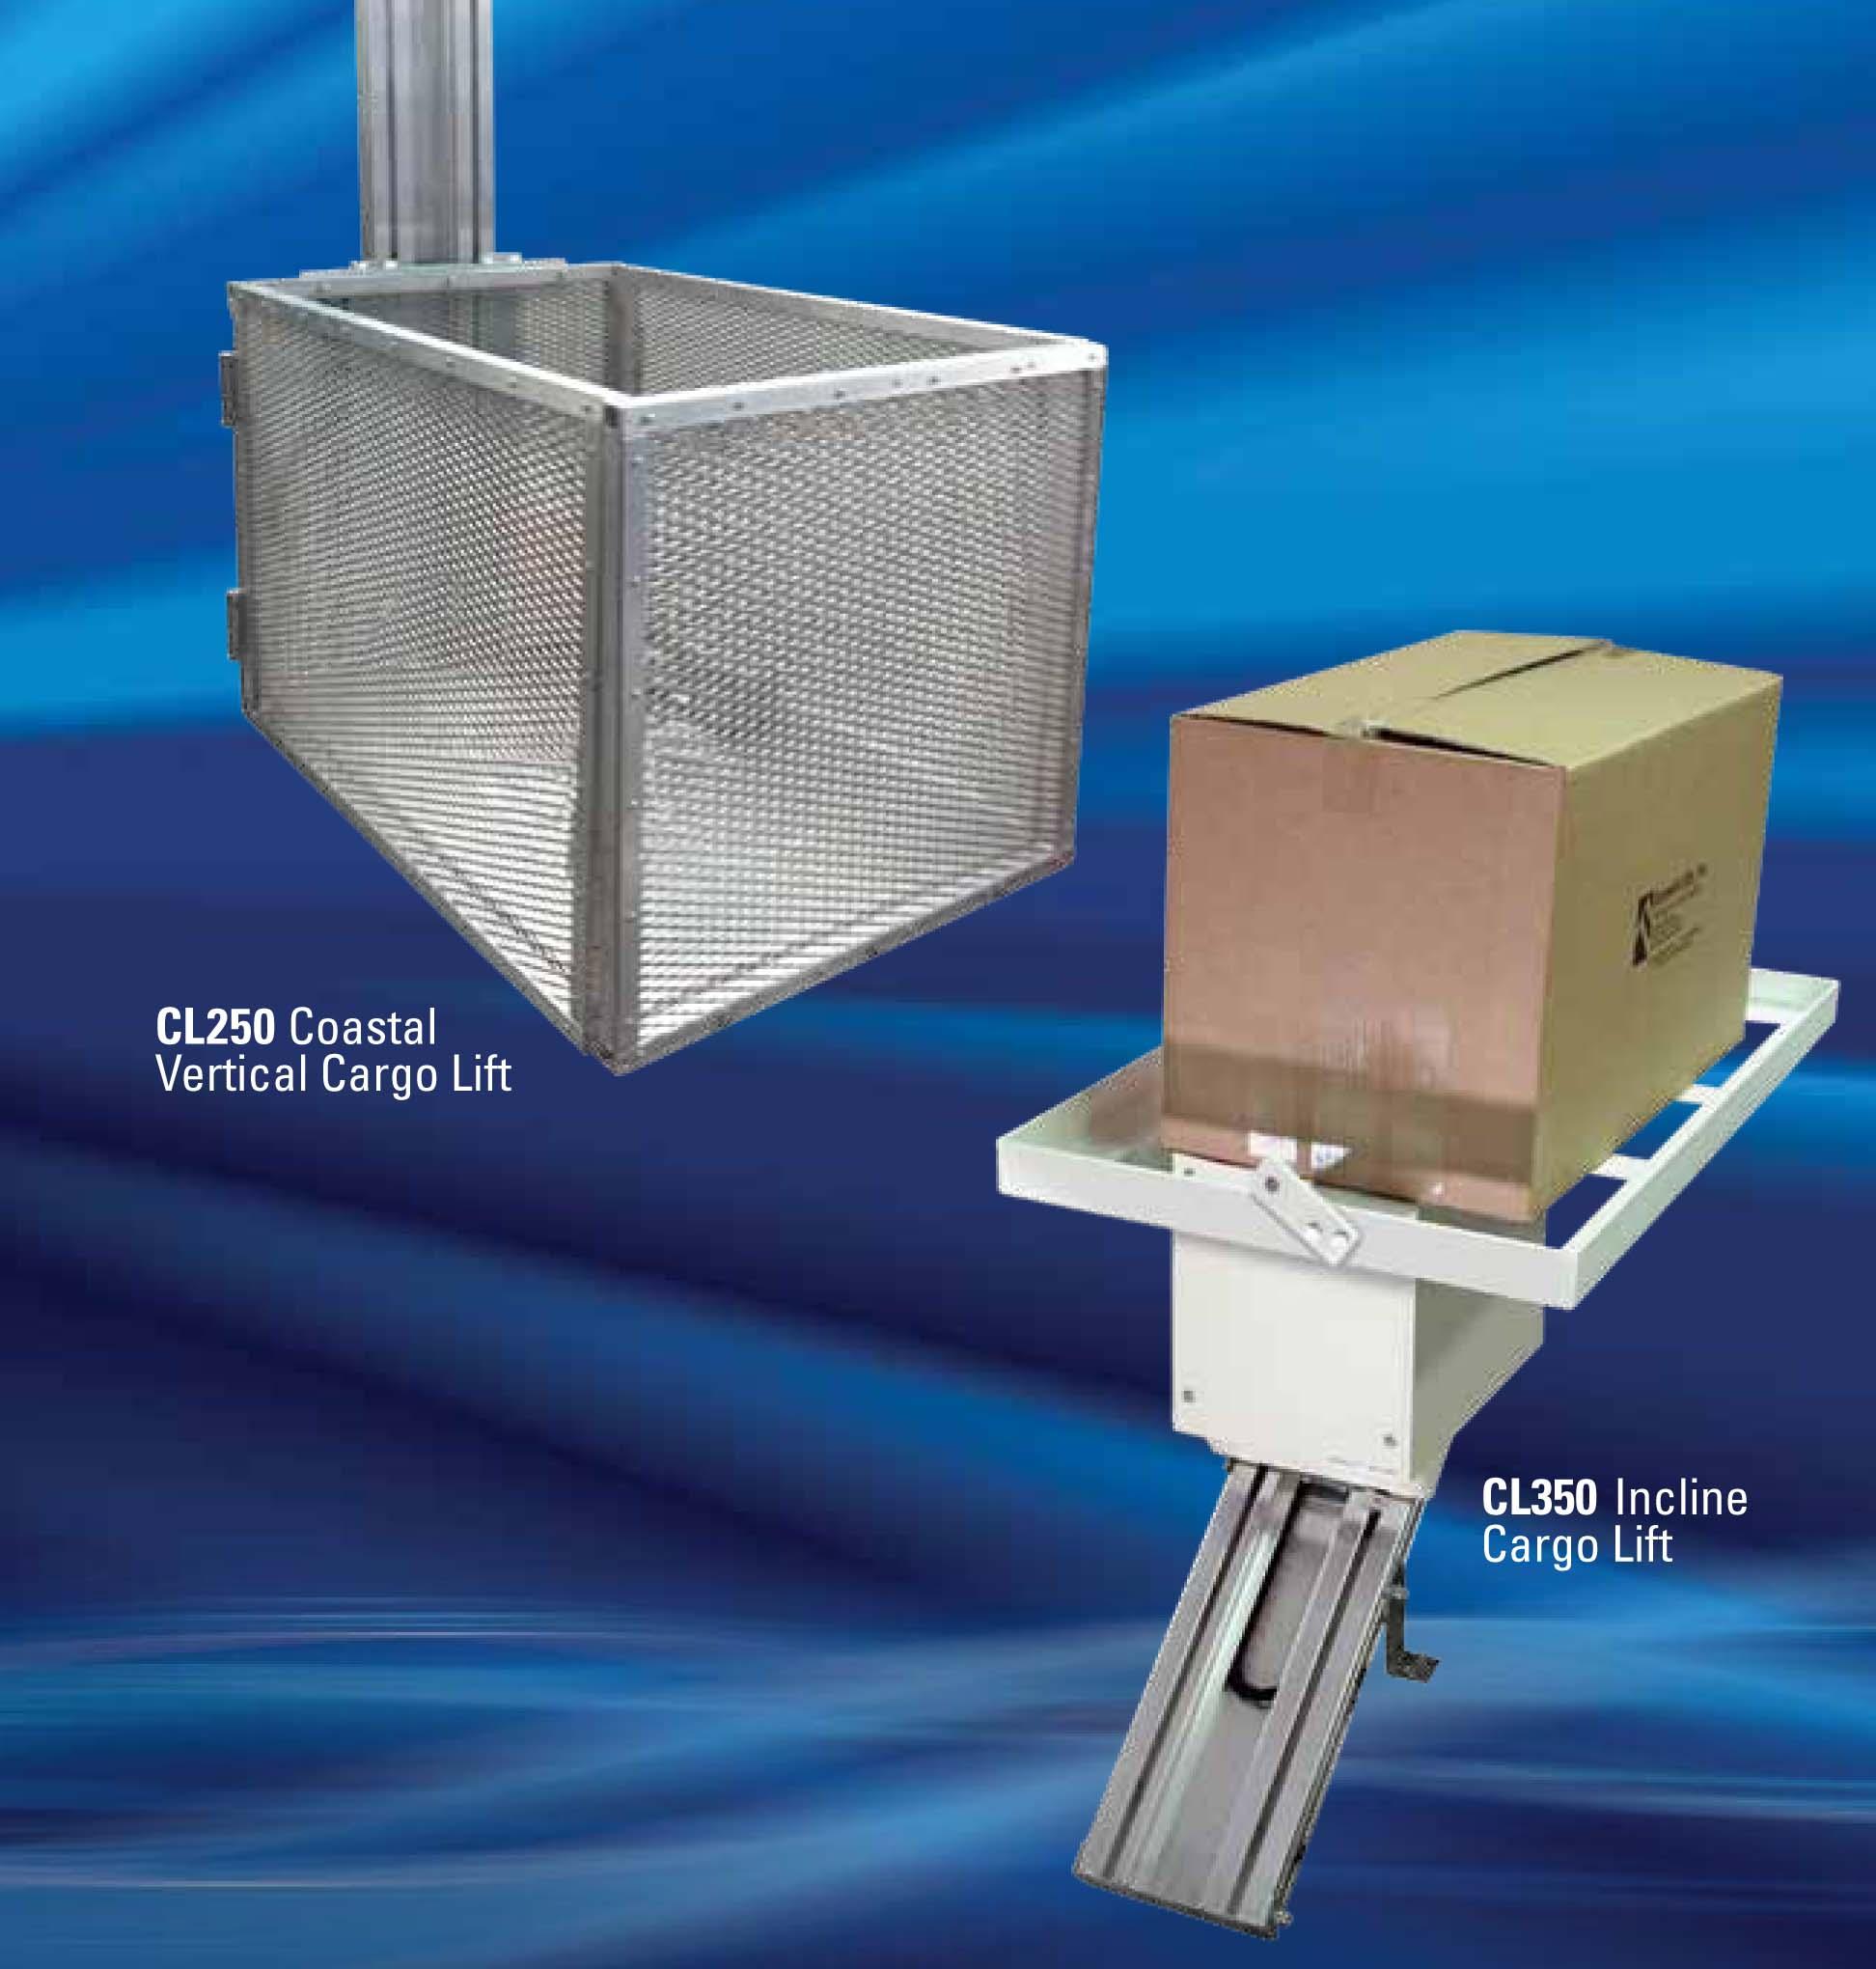 Sistema elevador Cargolift